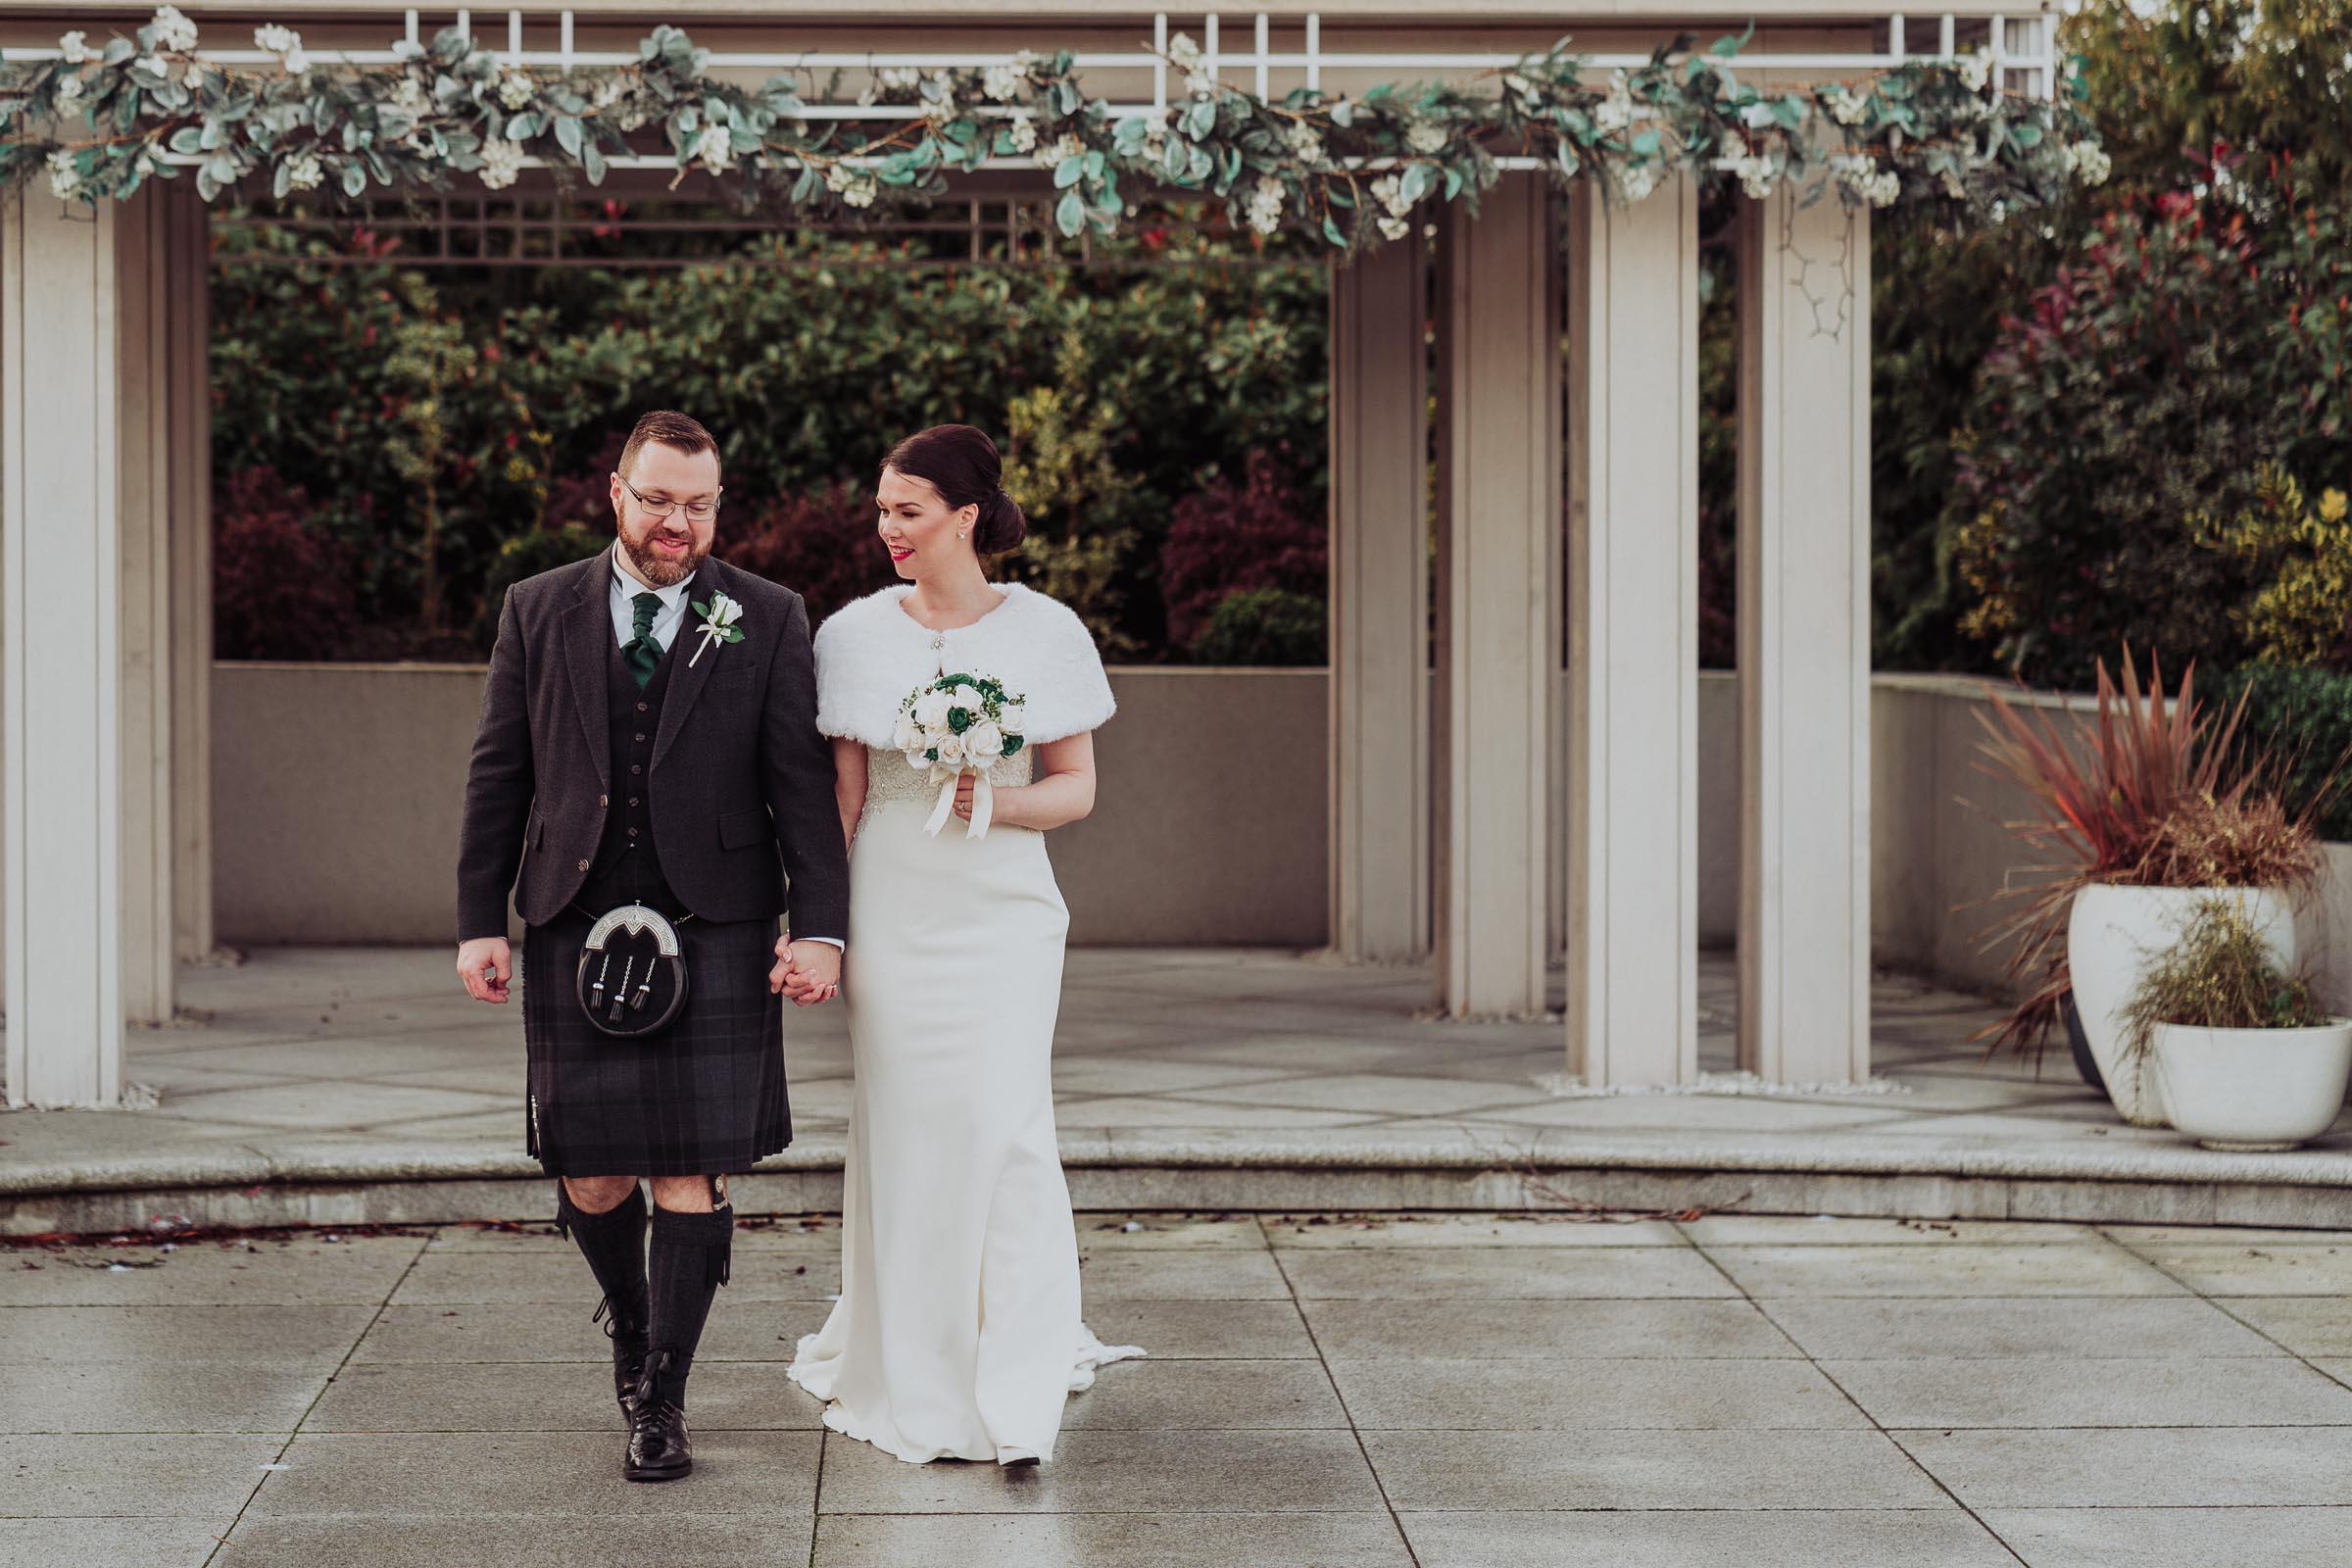 Radstone-Wedding-photographer-glasgow (5 of 5).jpg